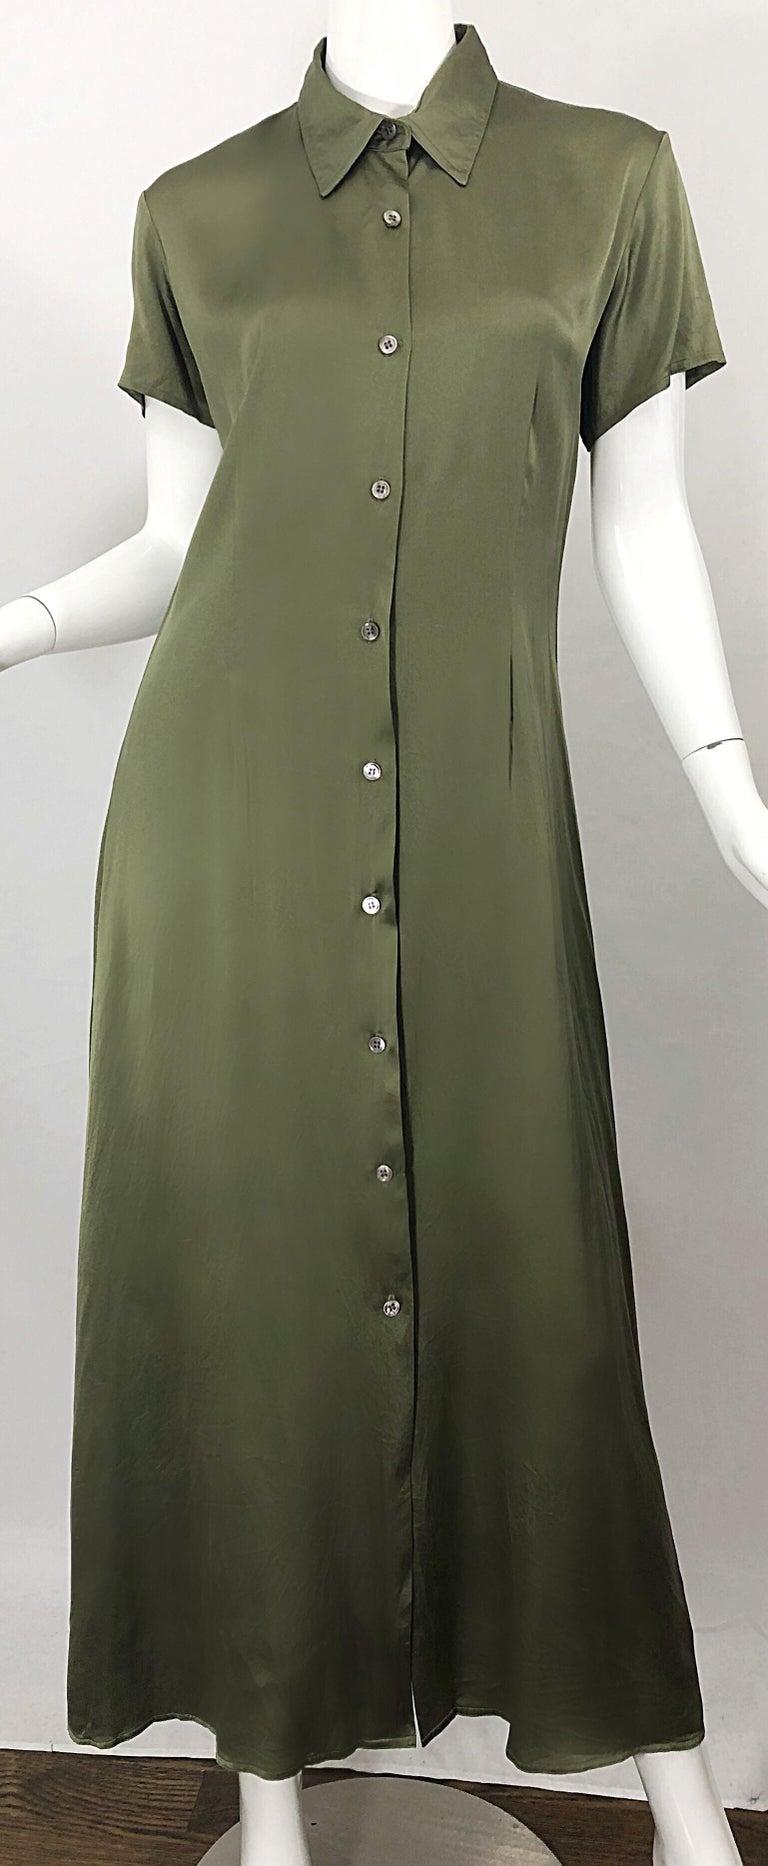 1970s Halston Olive Green Liquid Silk Vintage 70s Short Sleeve Maxi Shirt Dress For Sale 2